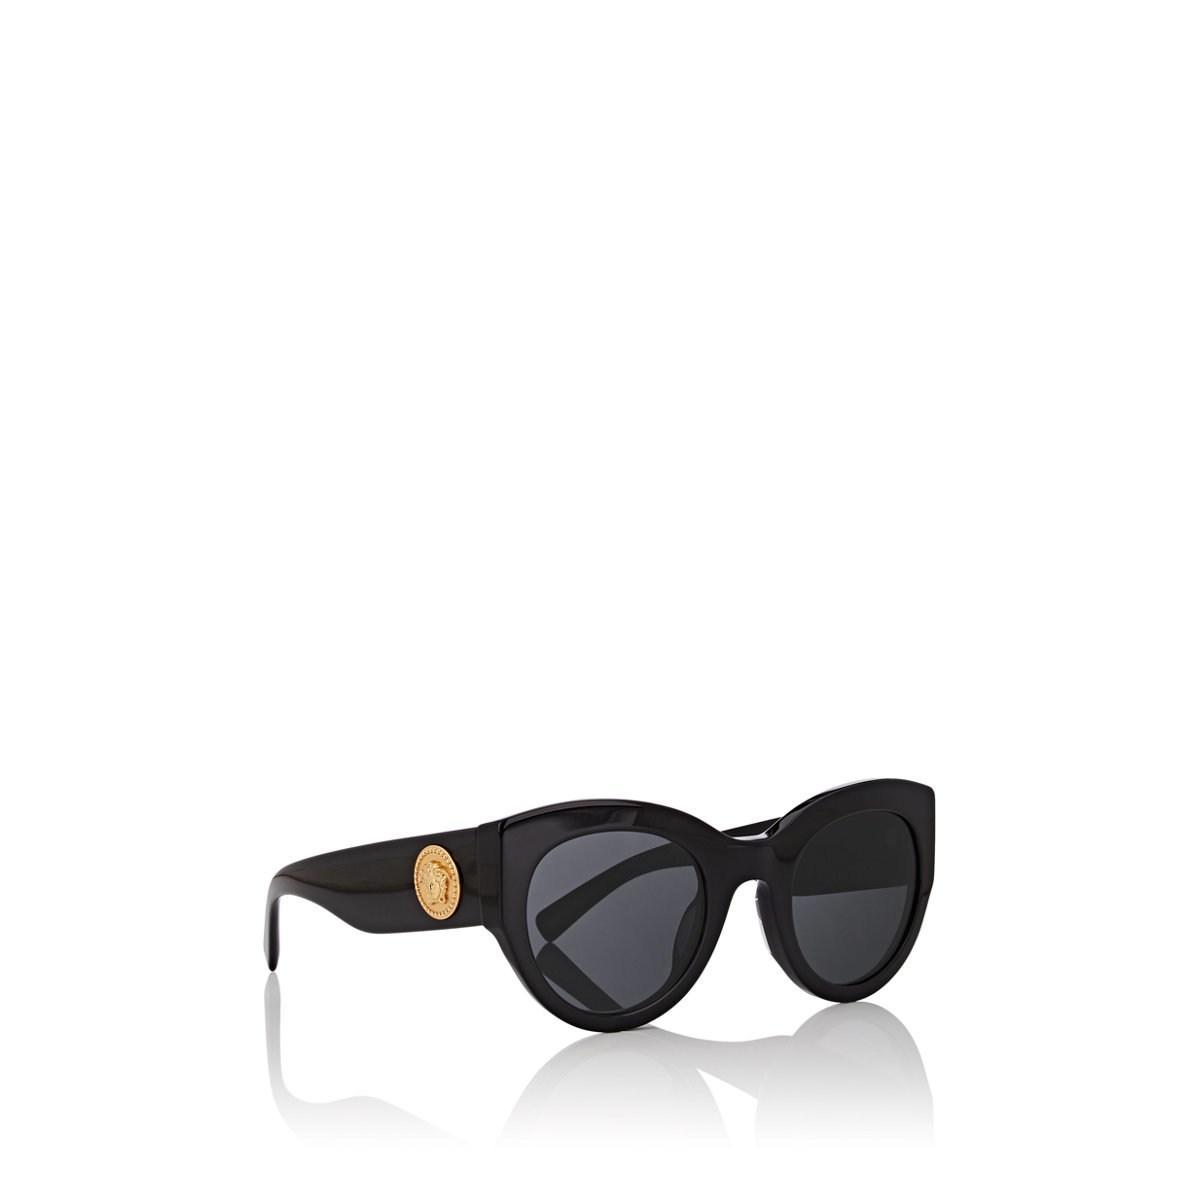 4f3c5655e5b7 Versace - Black Tribute Sunglasses - Lyst. View fullscreen